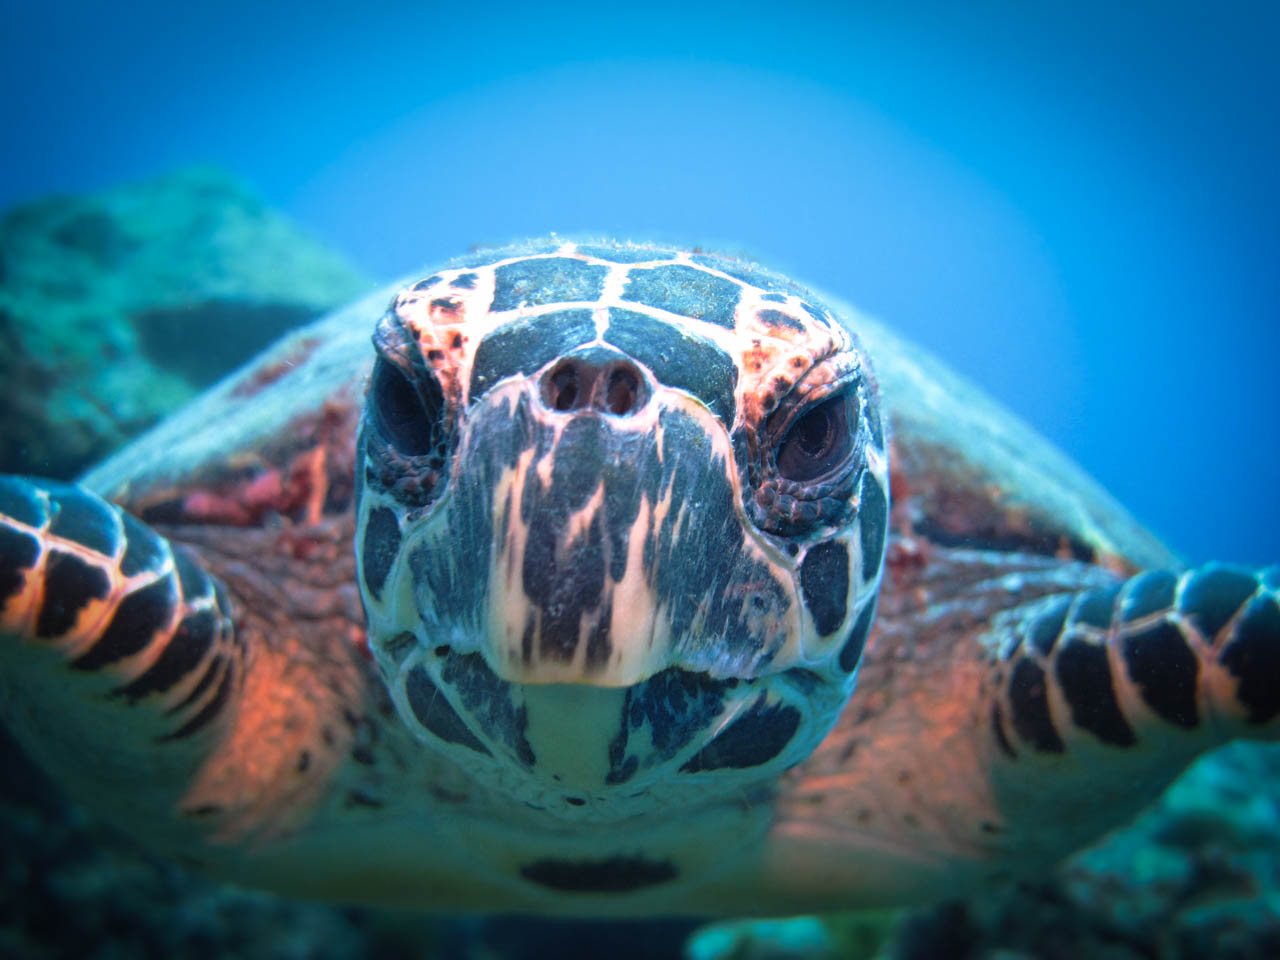 Turtley cool